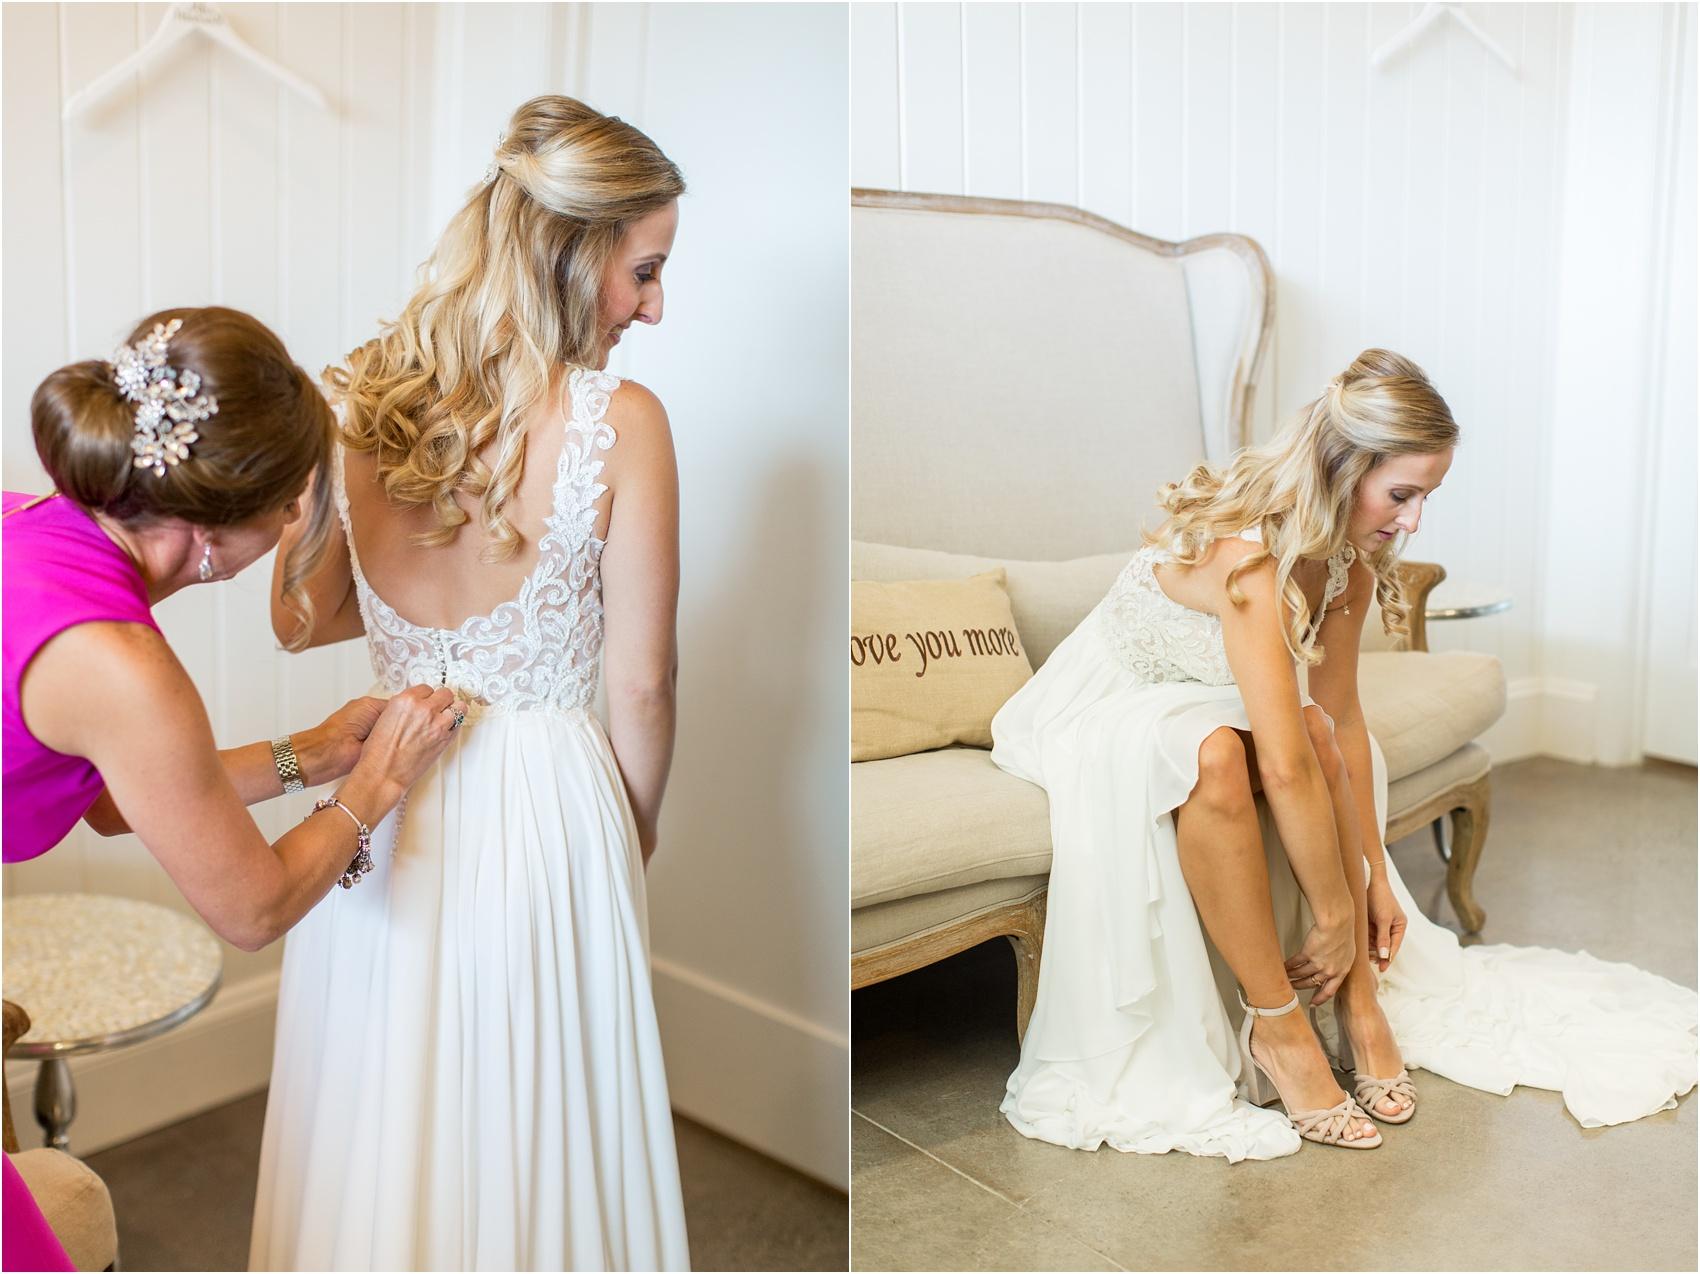 Savannah Eve Photography- Jurek-Woodworth Wedding- Sneak Peek-7.jpg